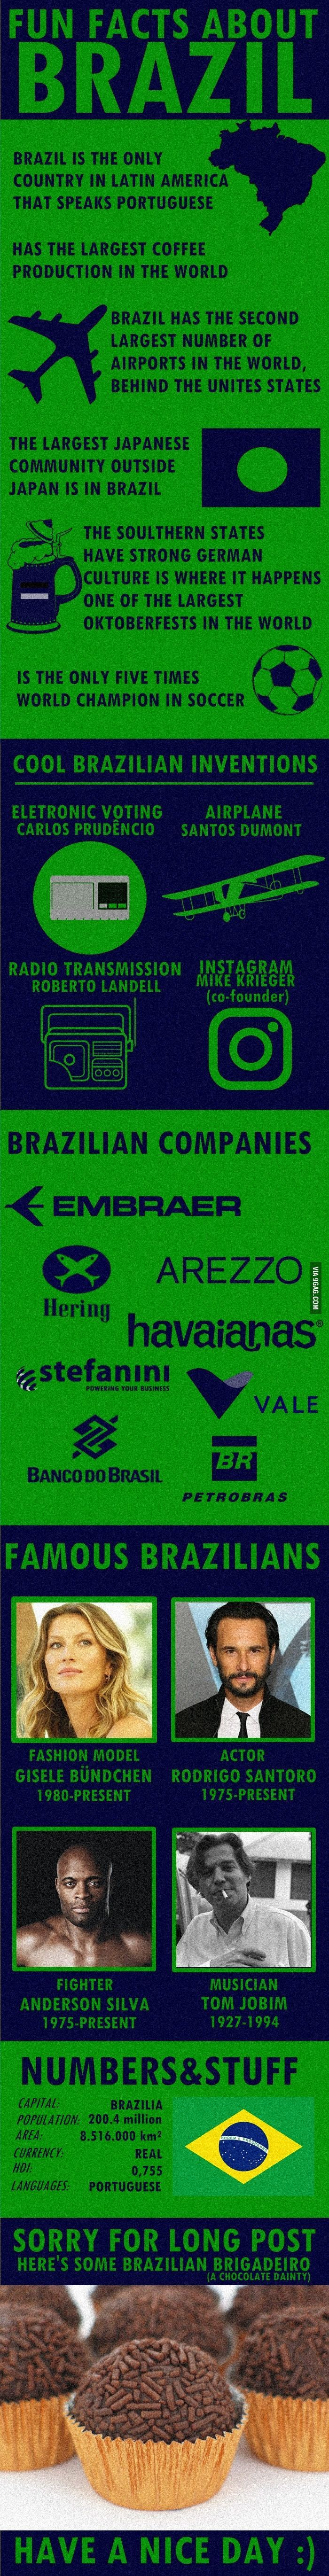 Fun facts about Brazil? http://ibeebz.com